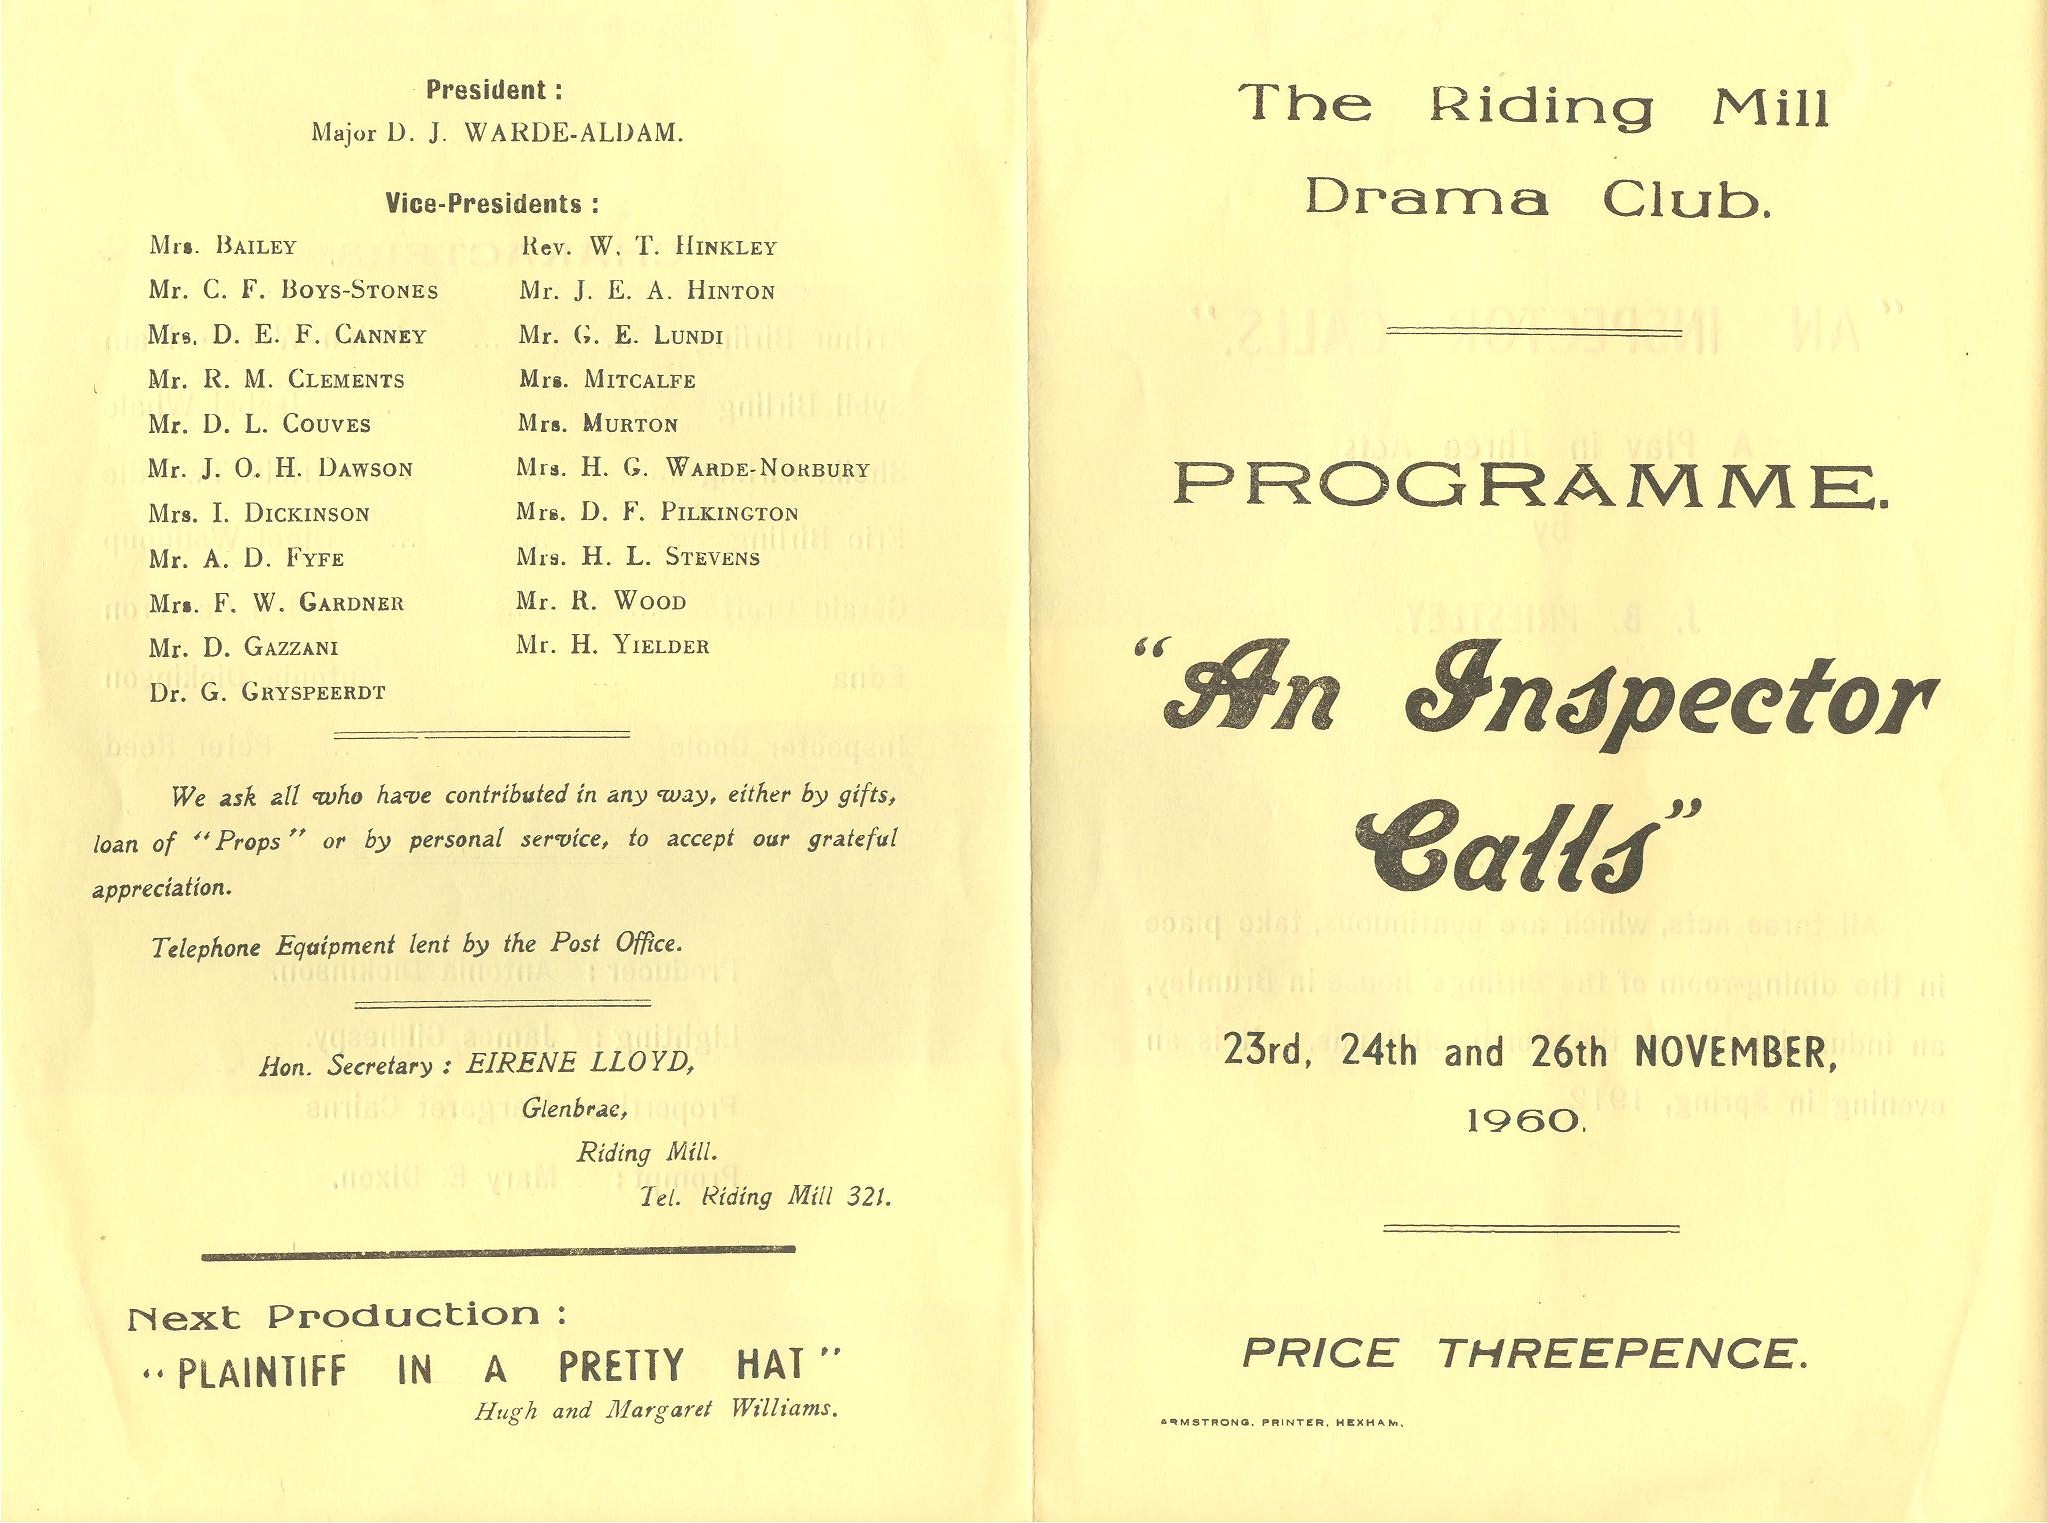 1960 Riding Mill Drama Club, An Inspecto